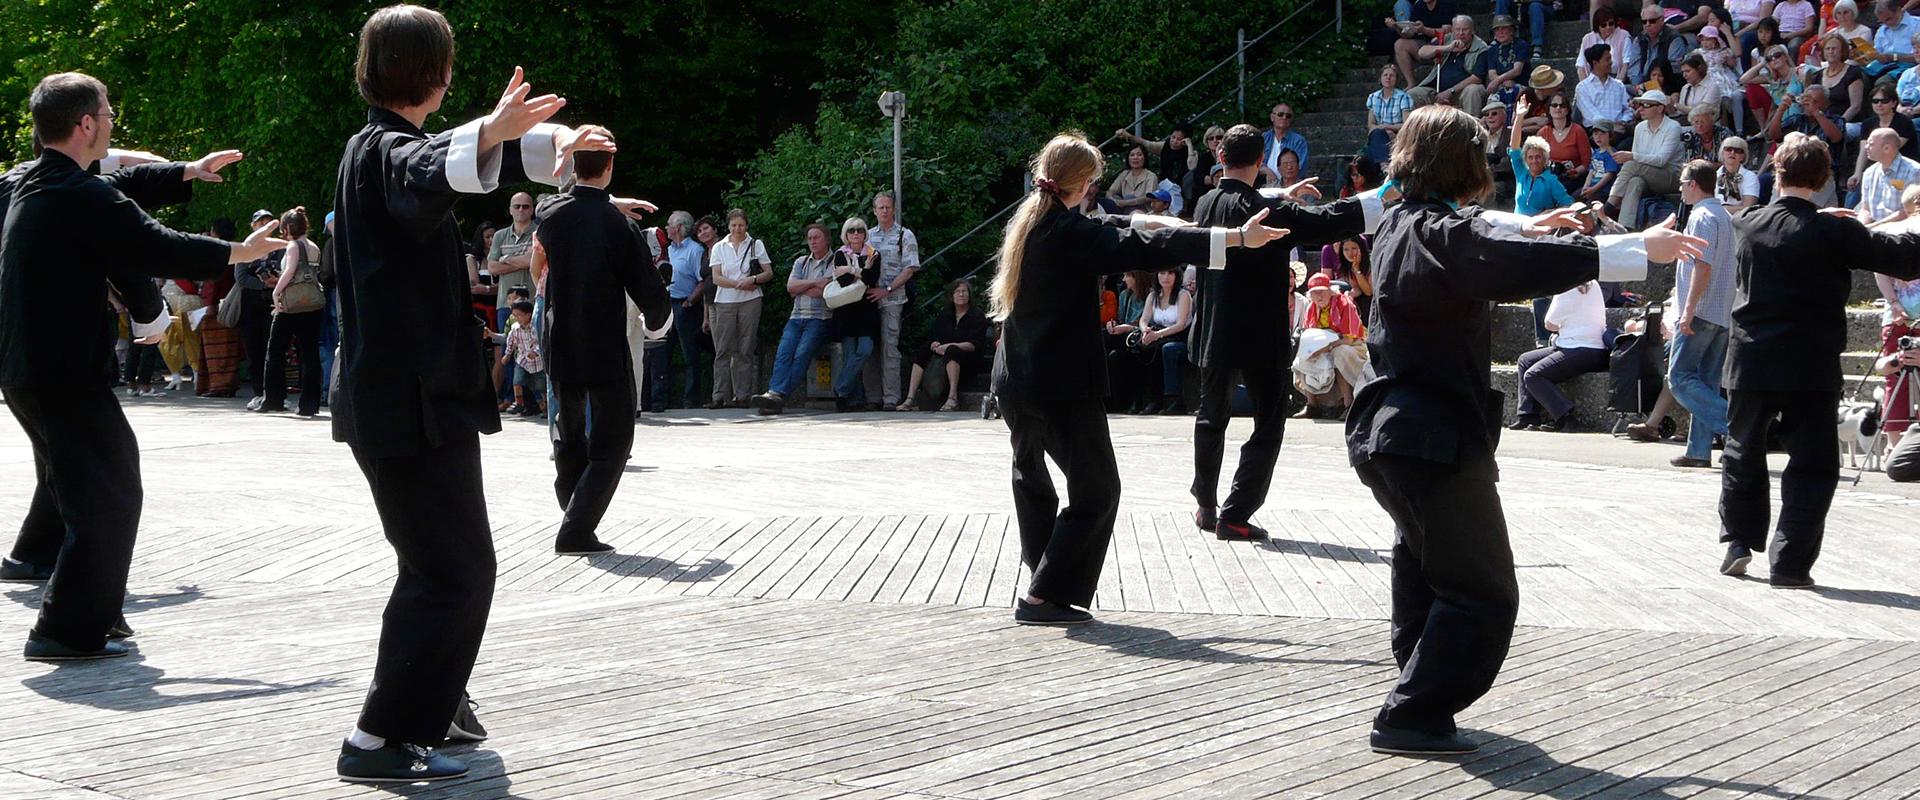 Auftritt Vesakh-Fest 2012, Form